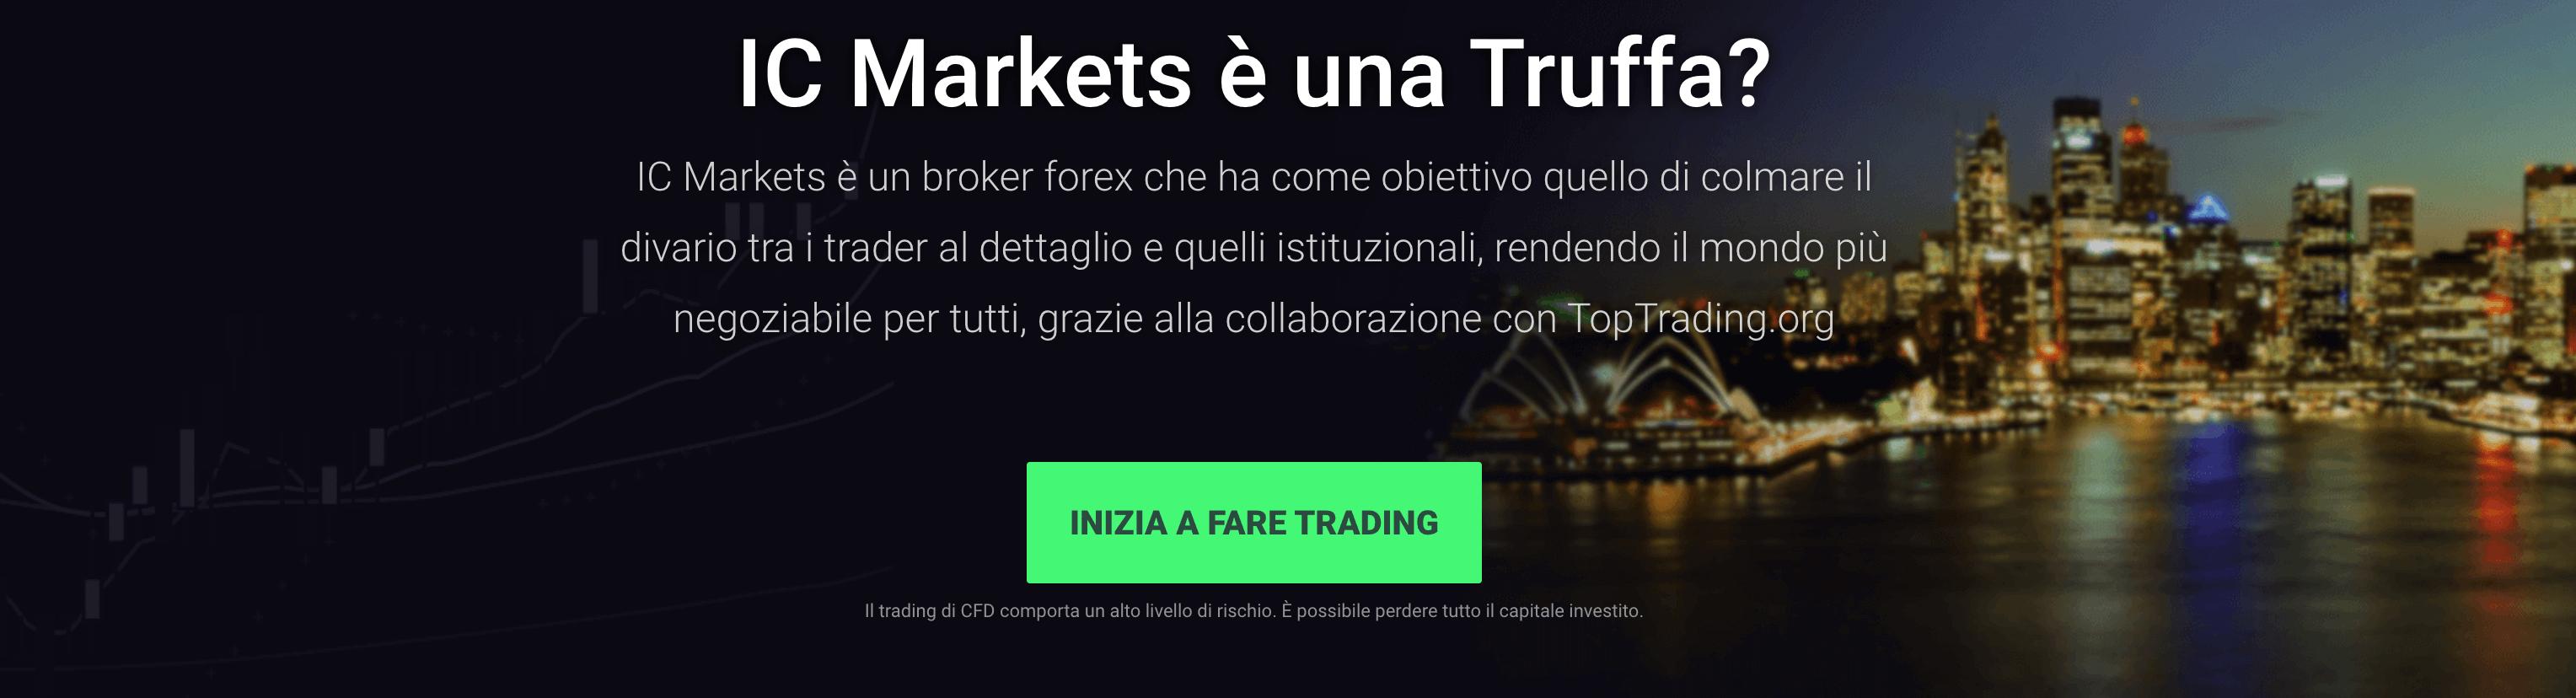 IC Markets è una Truffa?